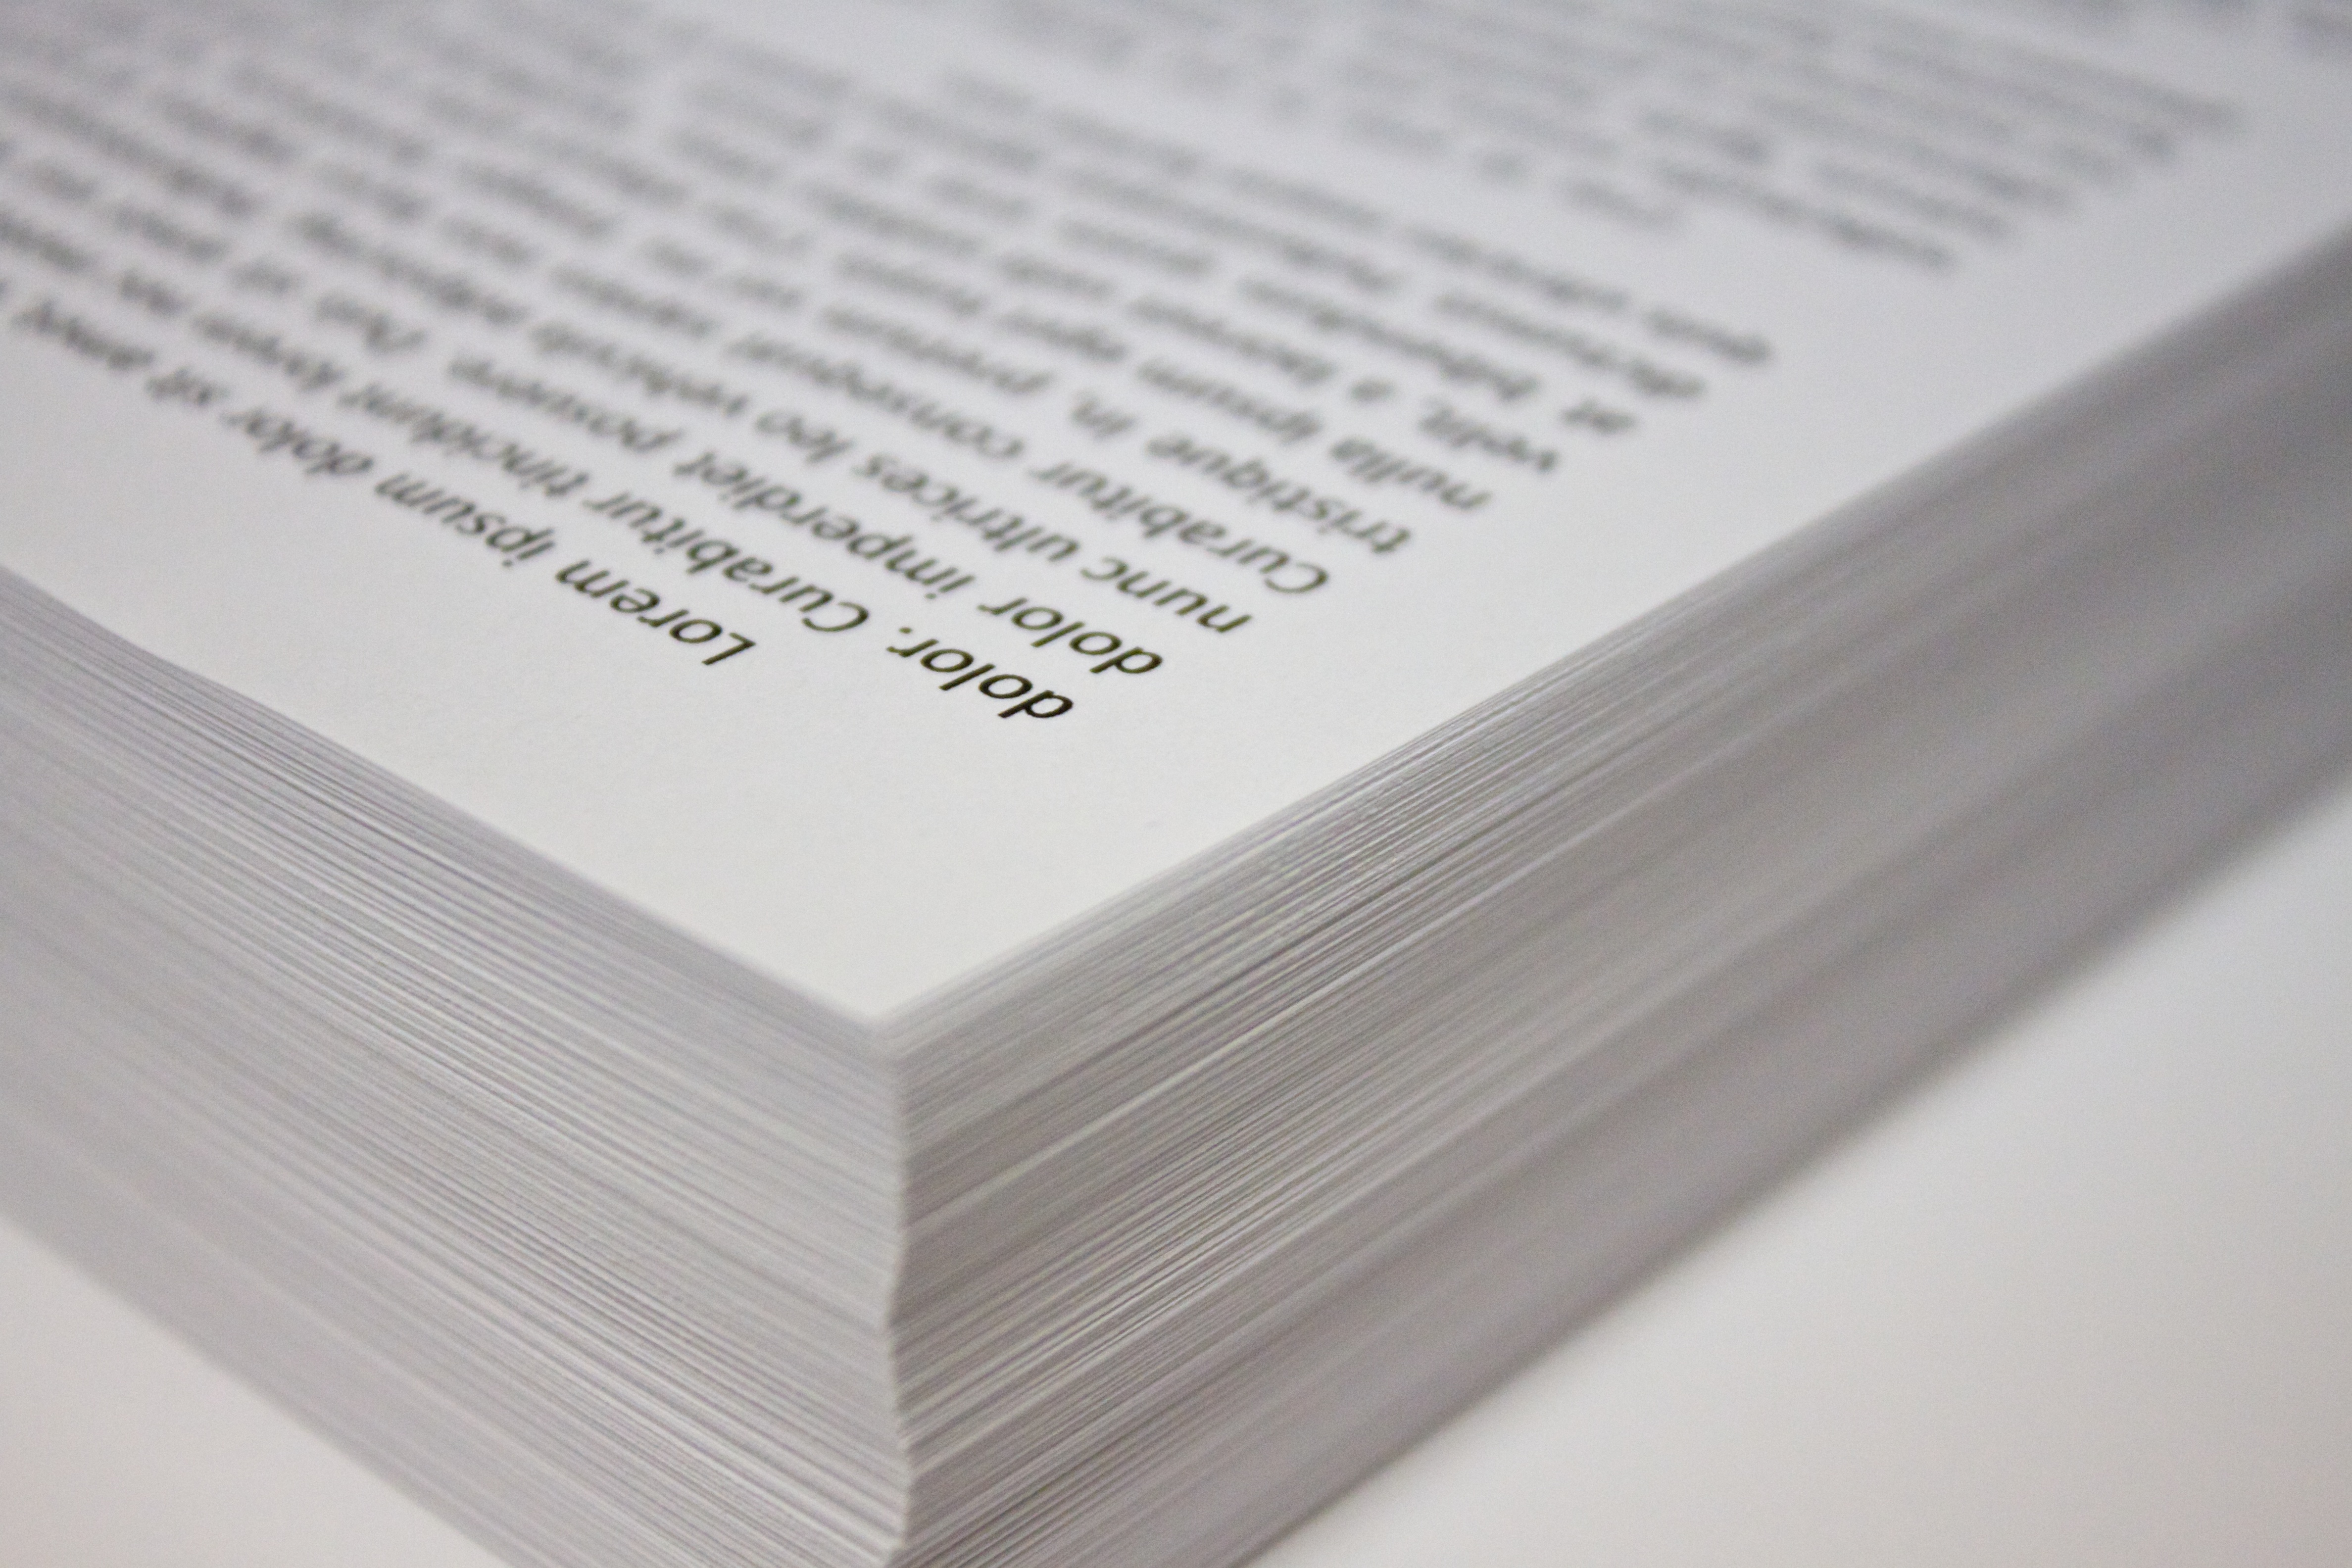 Printen zonder printer